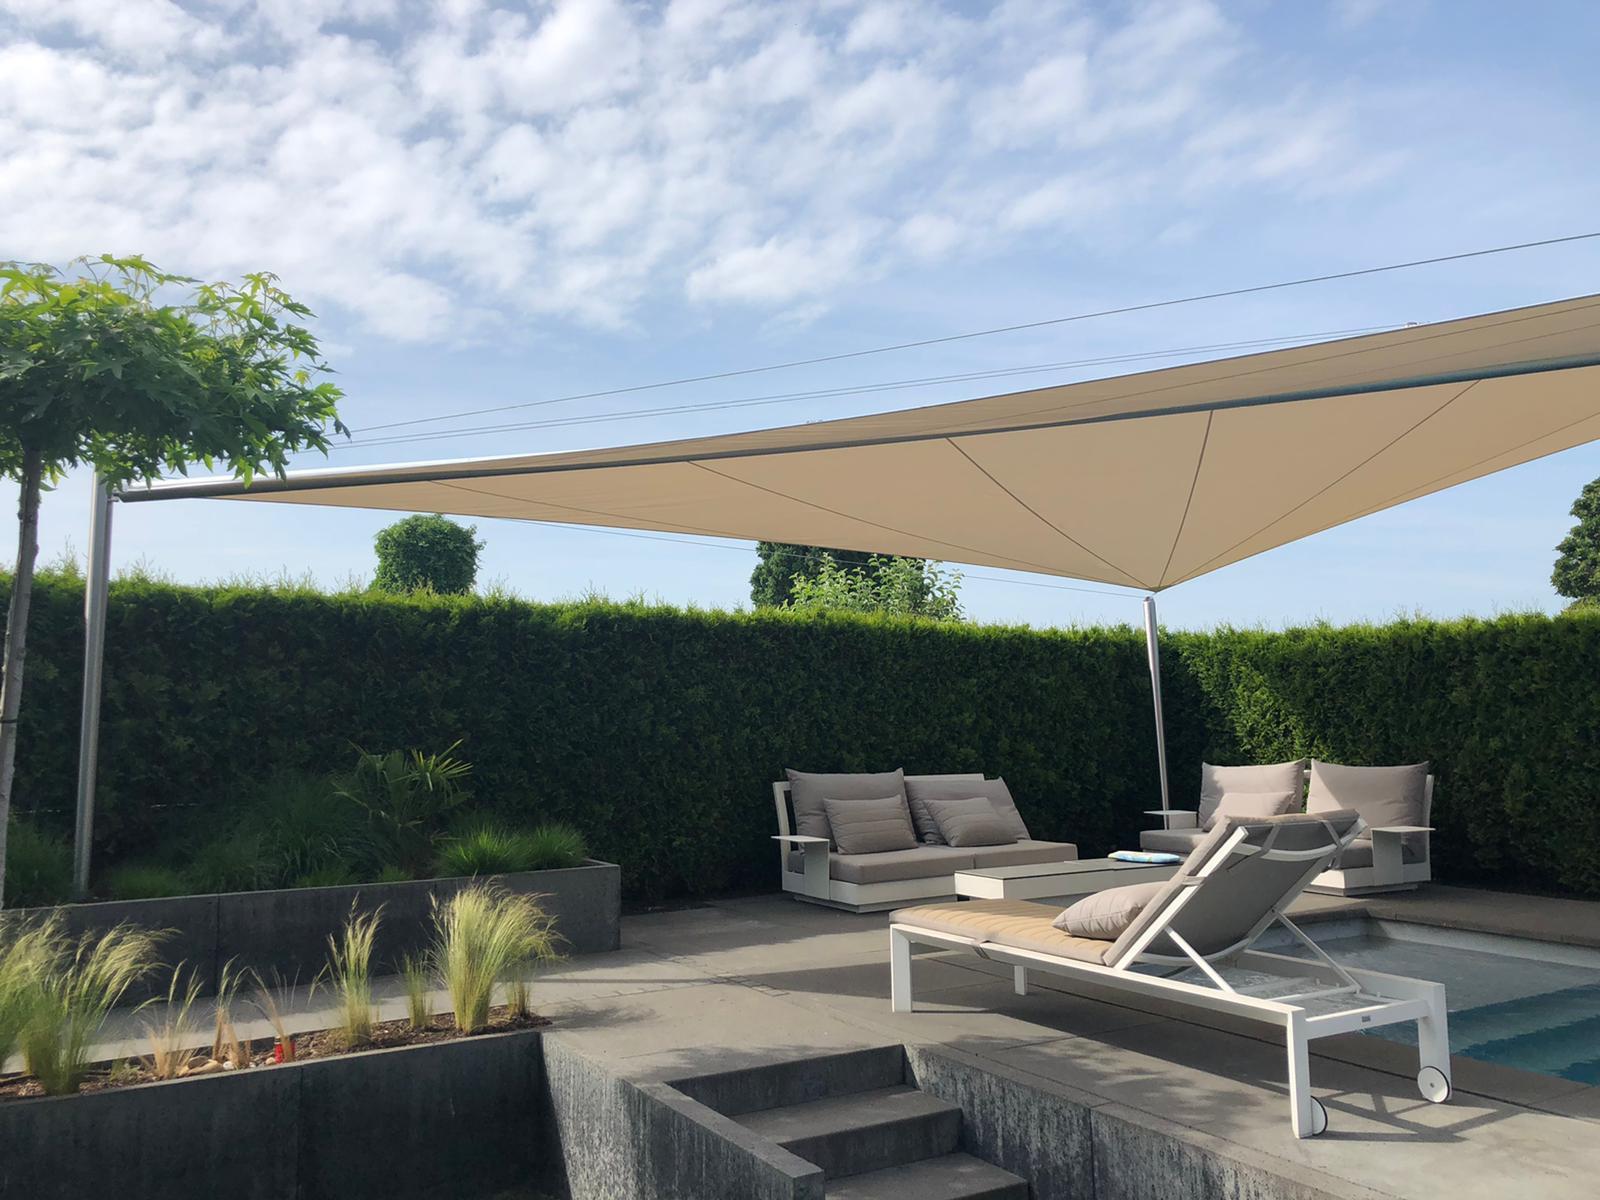 aerosun® roller sail (Sun Furl System), Pool and Outdoorlounge